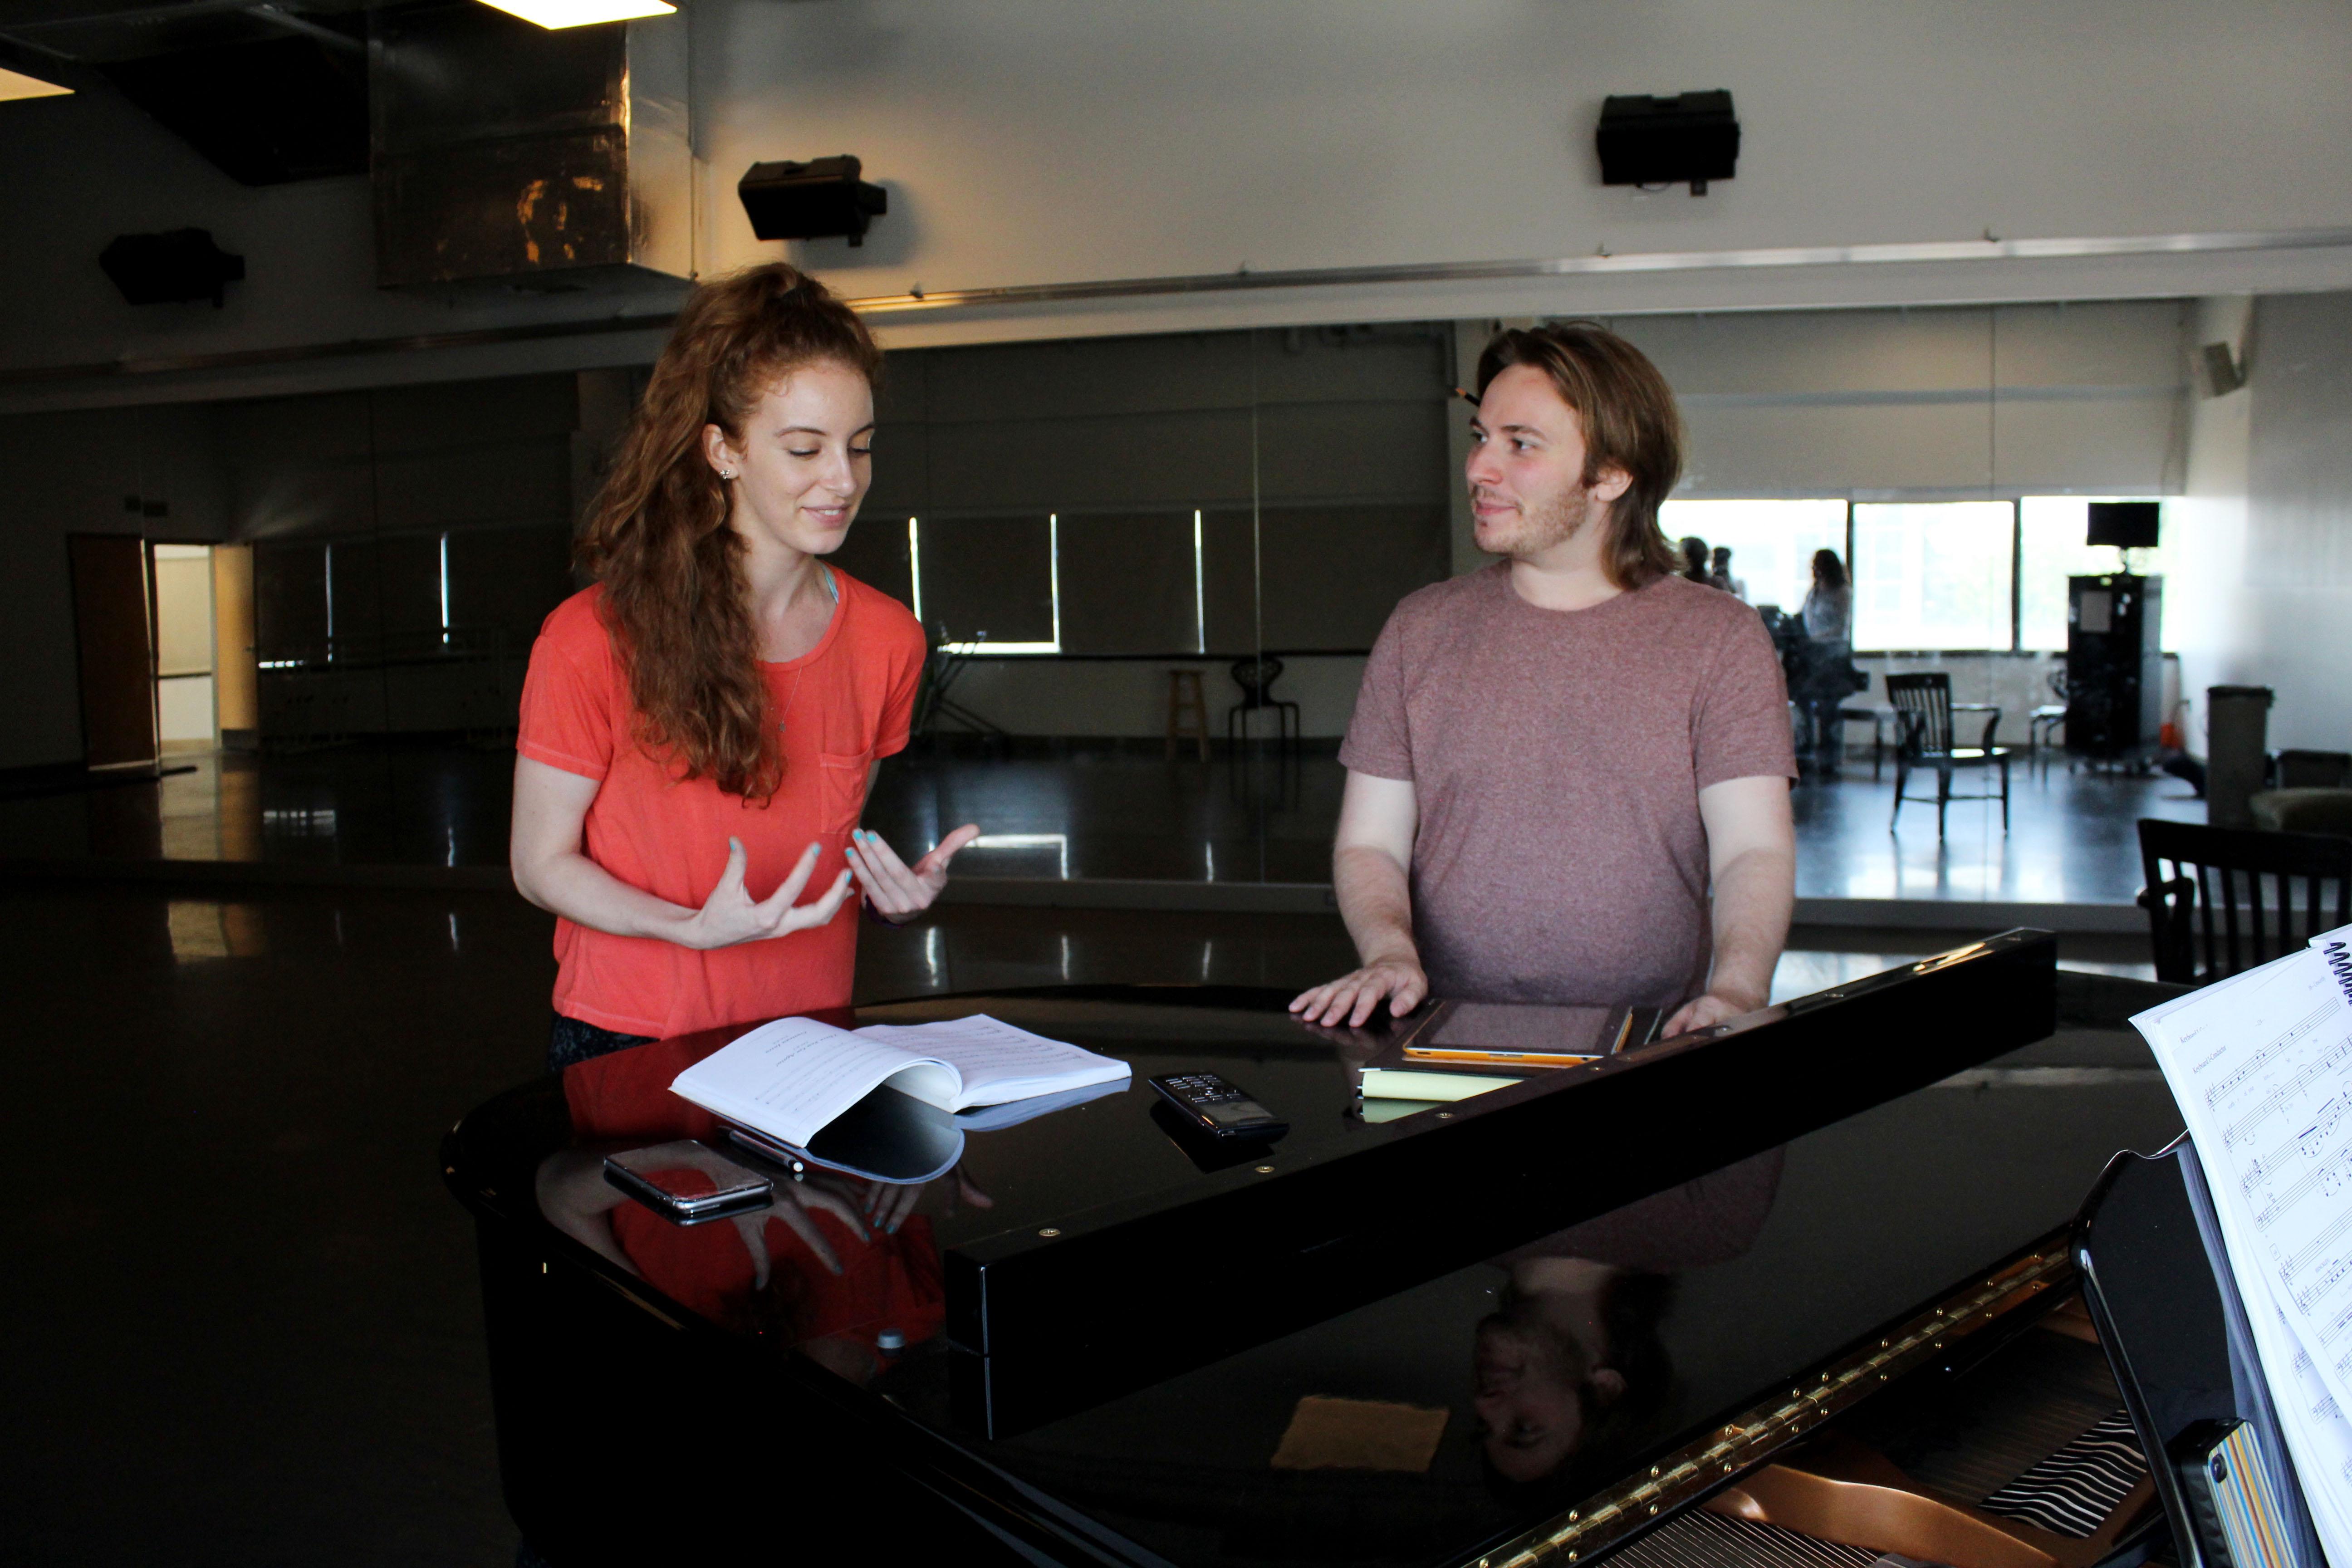 e05a61f9eff1c418279f_Lily_Davis_and_Chris_Beard_in_rehearsal.jpg